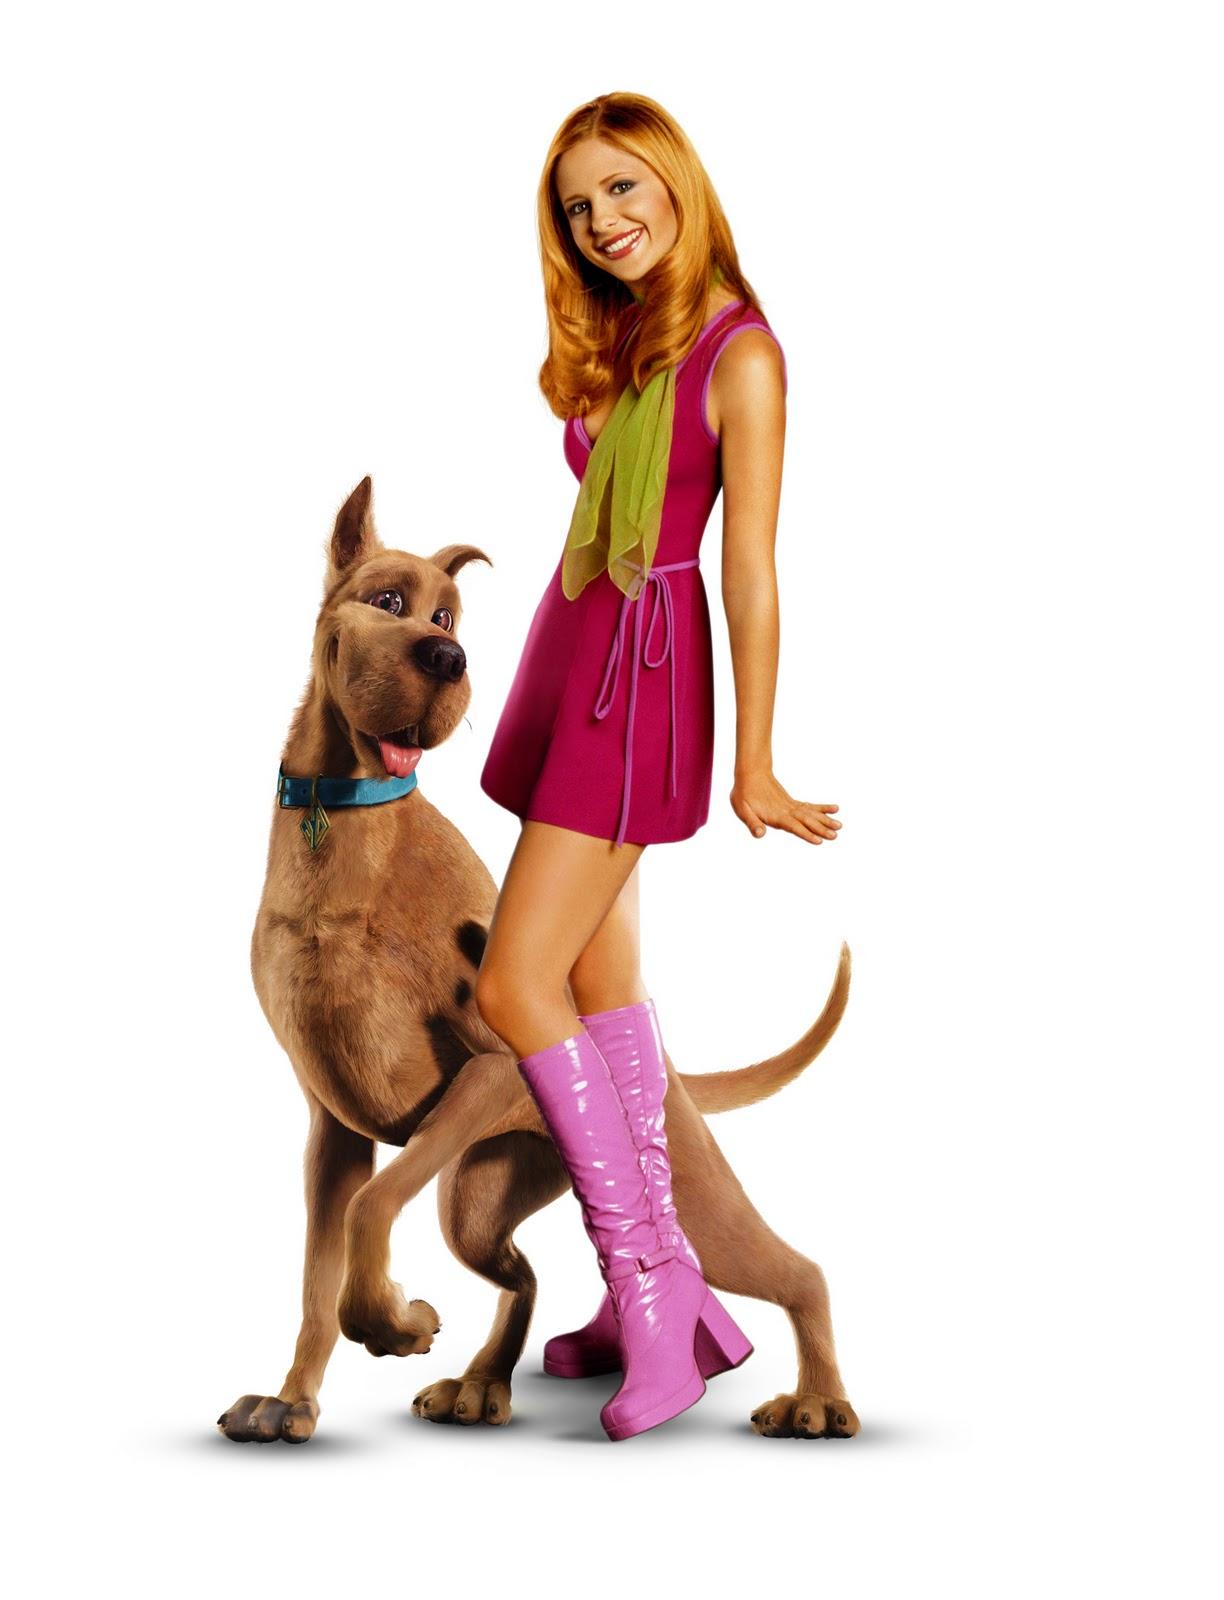 Daphne Blake Scooby Doo Movie